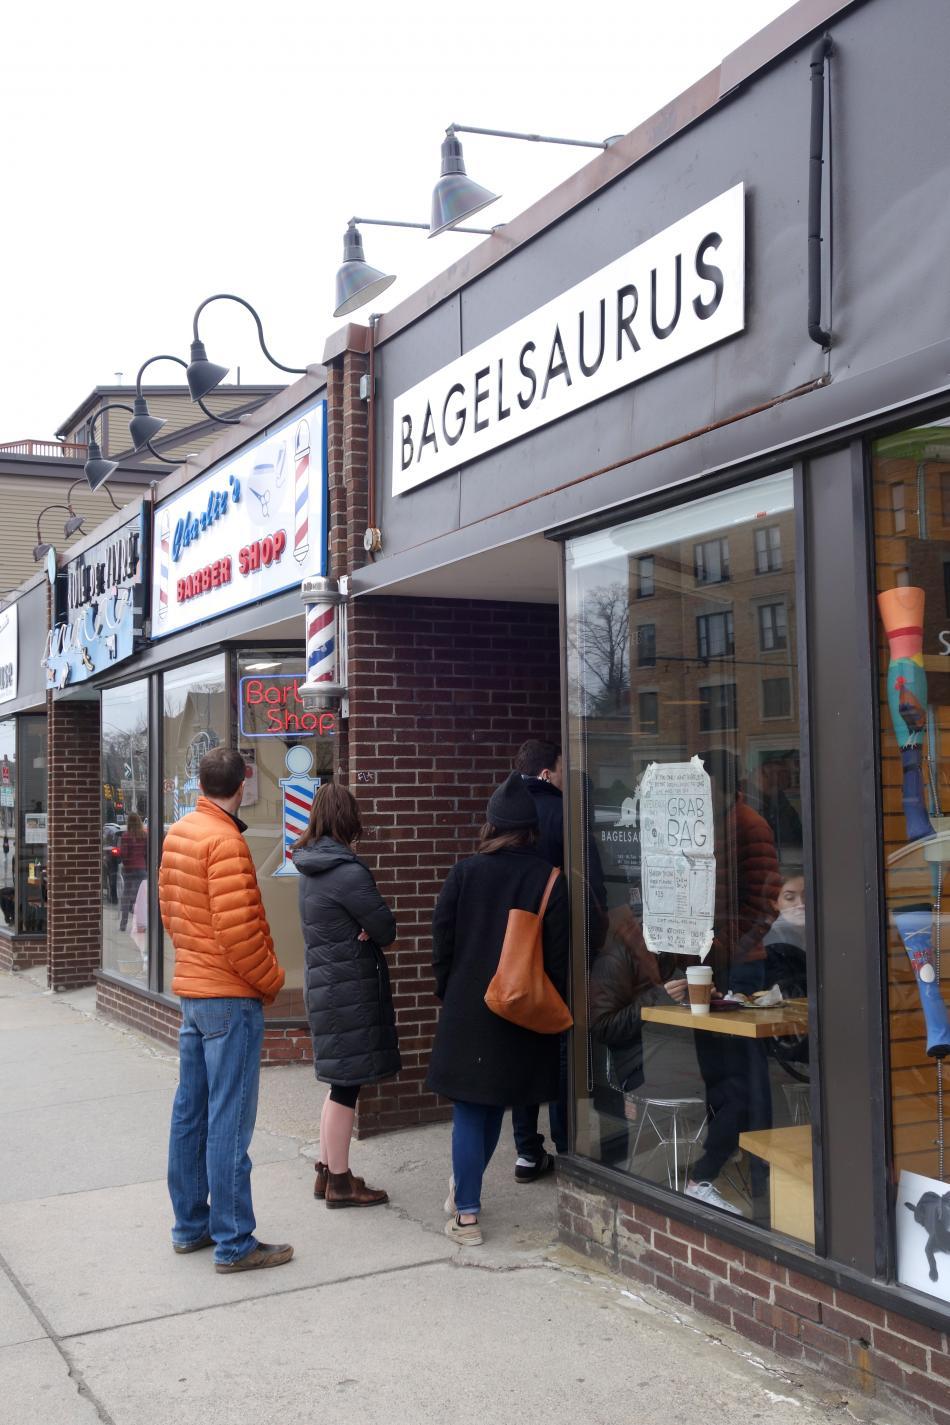 Bagelsaurus Storefront